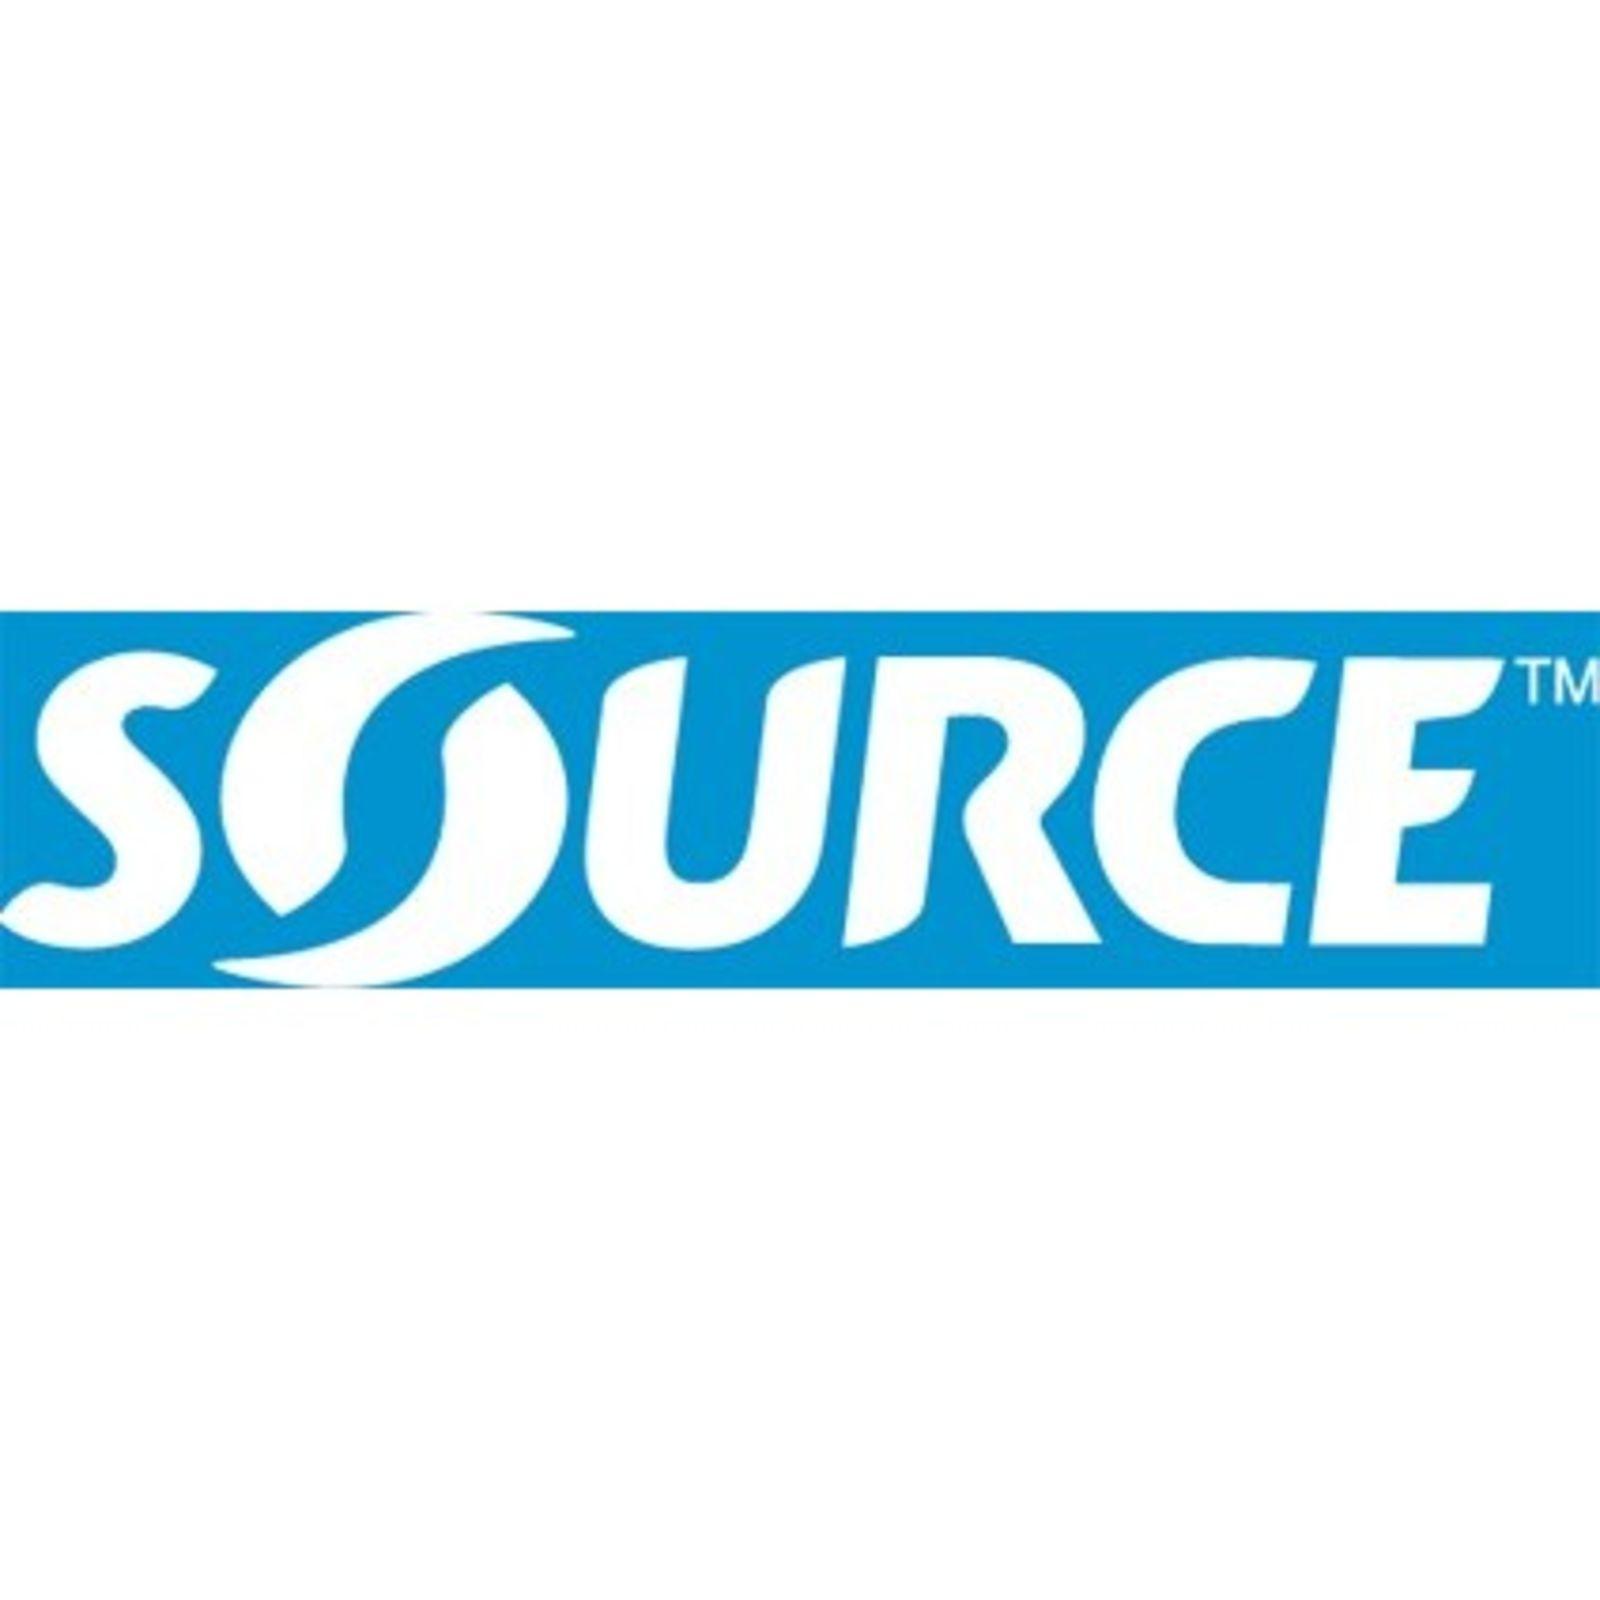 SOURCE®